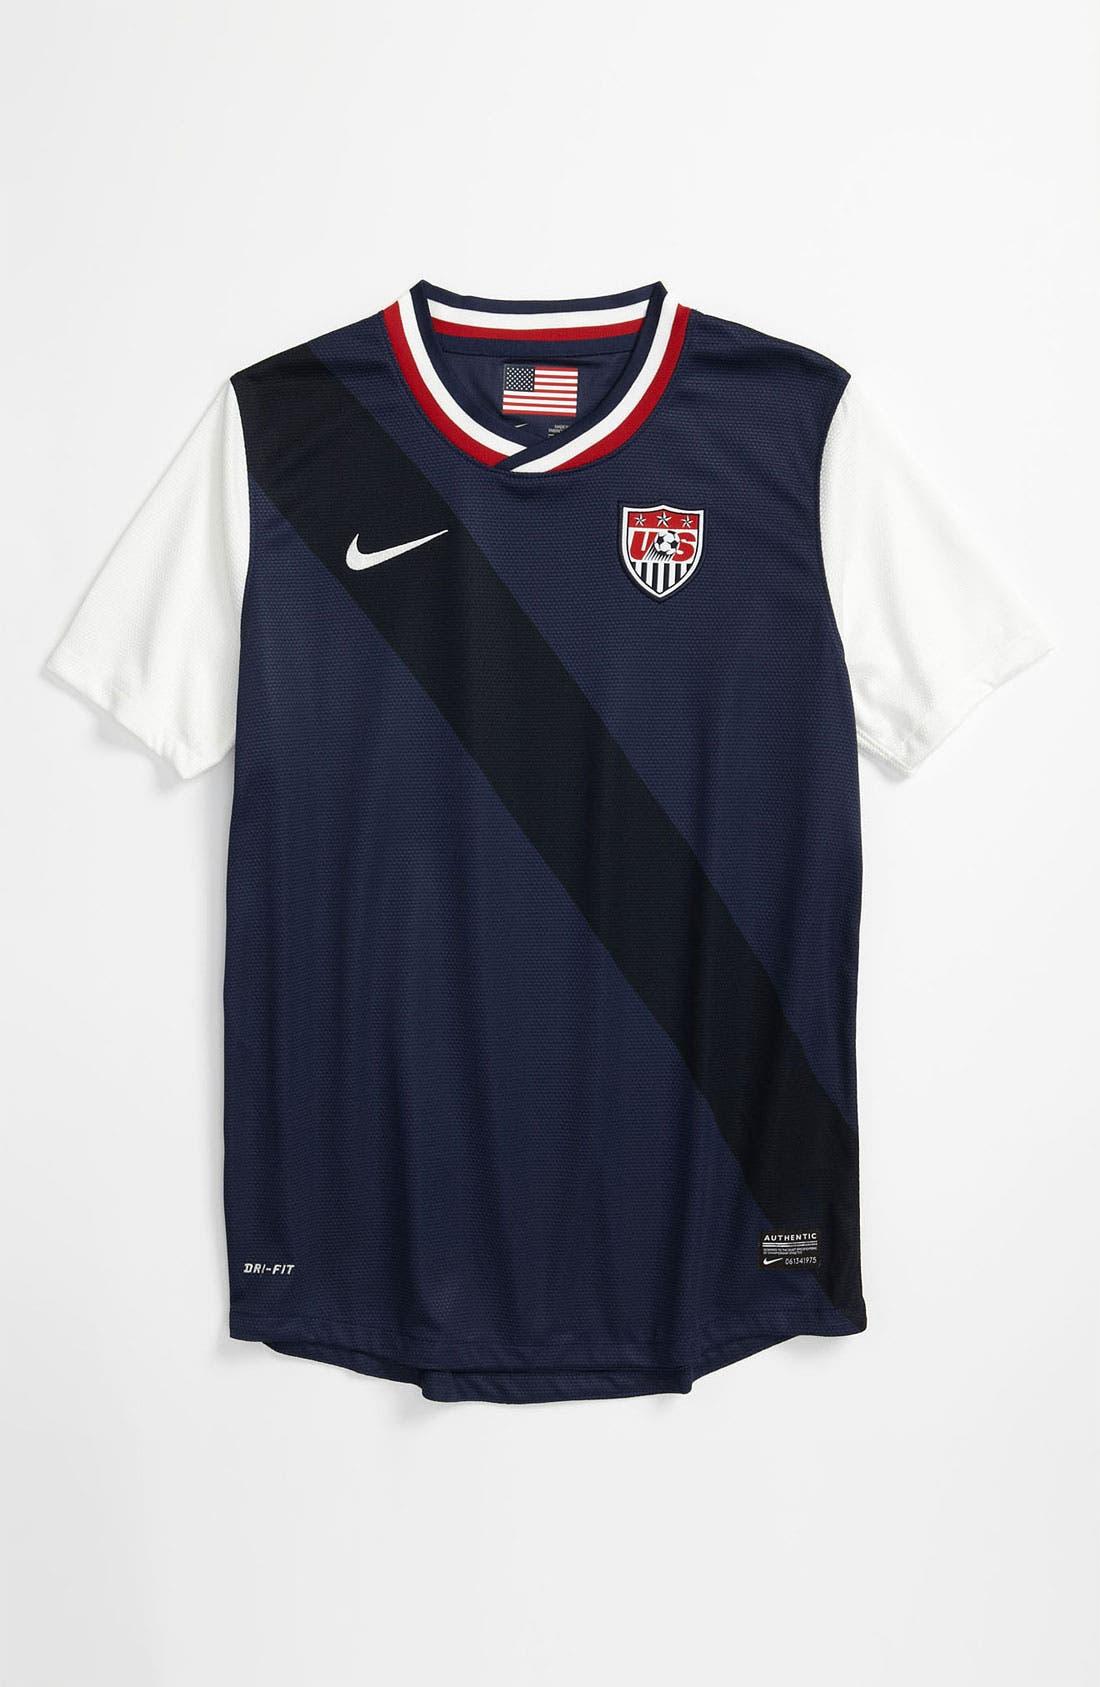 Main Image - Nike 'USA Away' Dri-FIT Jersey (Big Boys)